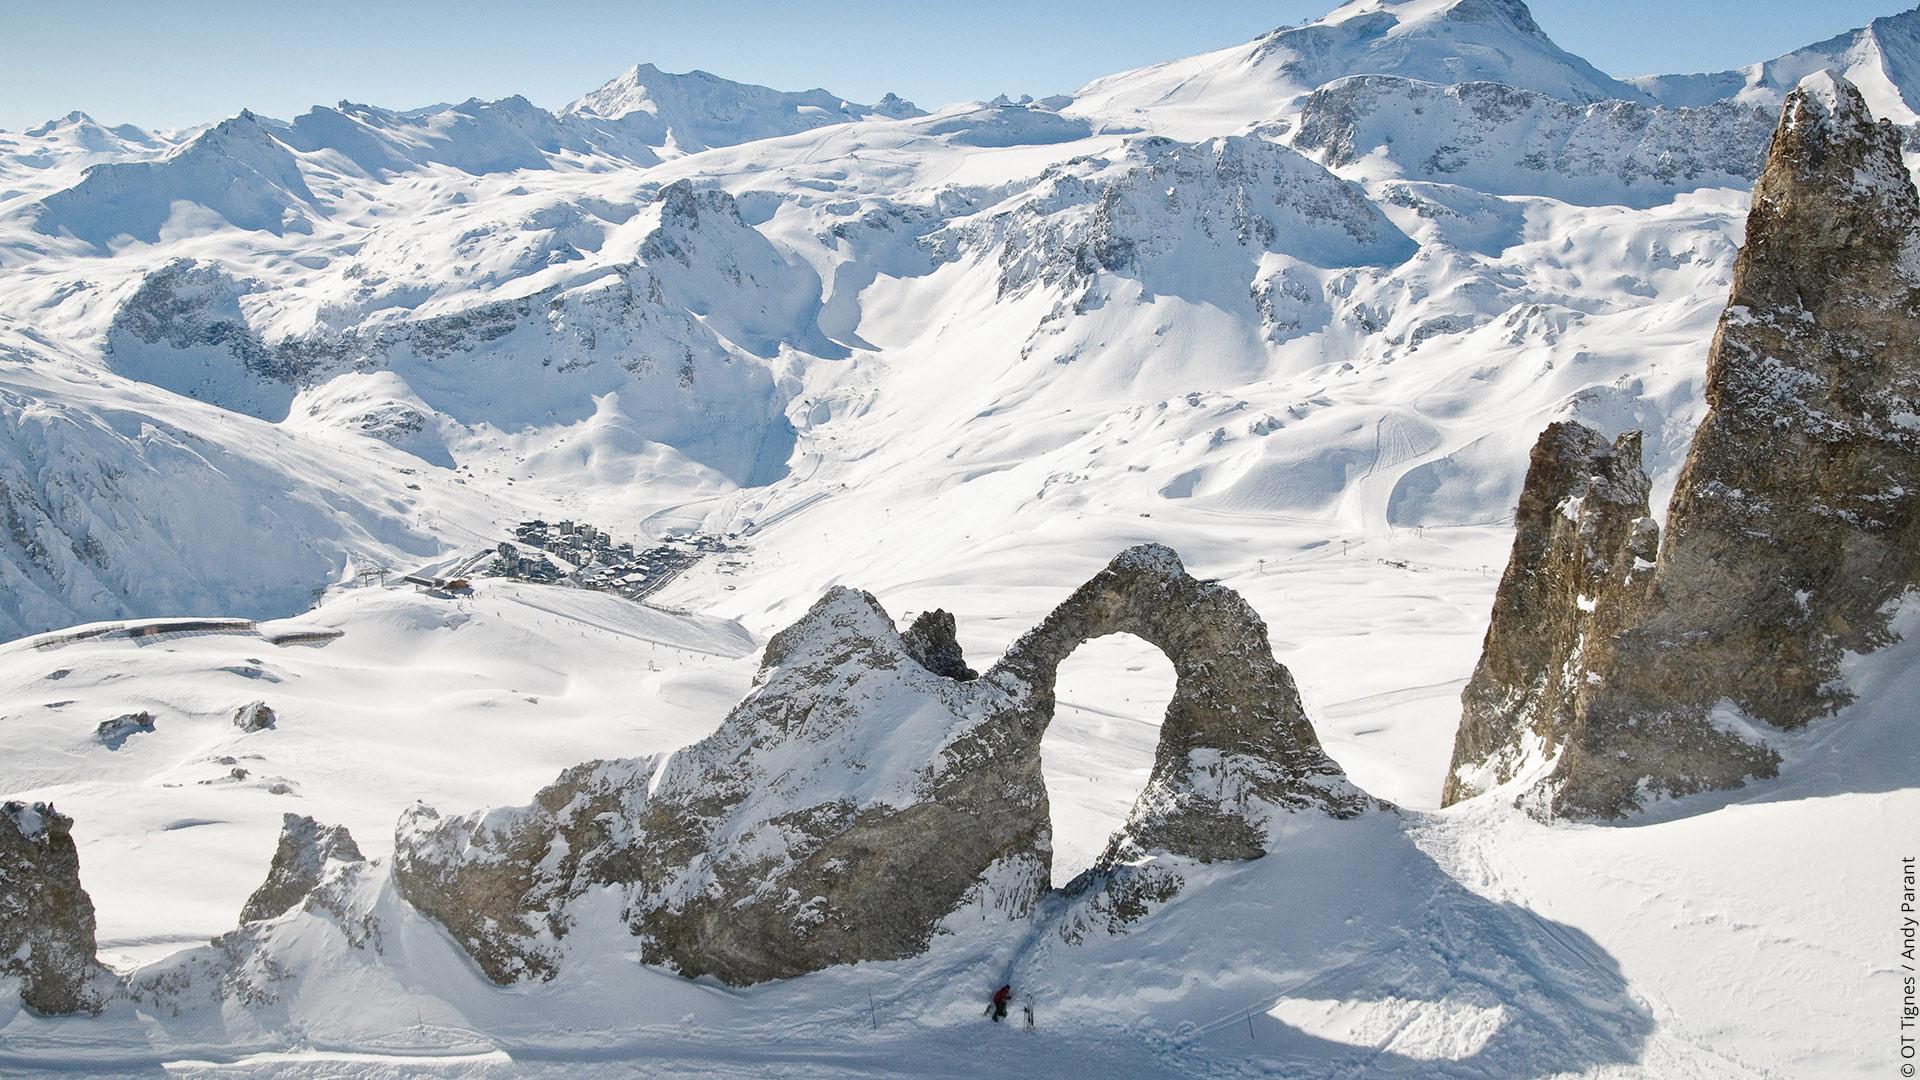 CGH Rsidences Location de vacances au ski Tignes CGH Rsidences 1920x1080